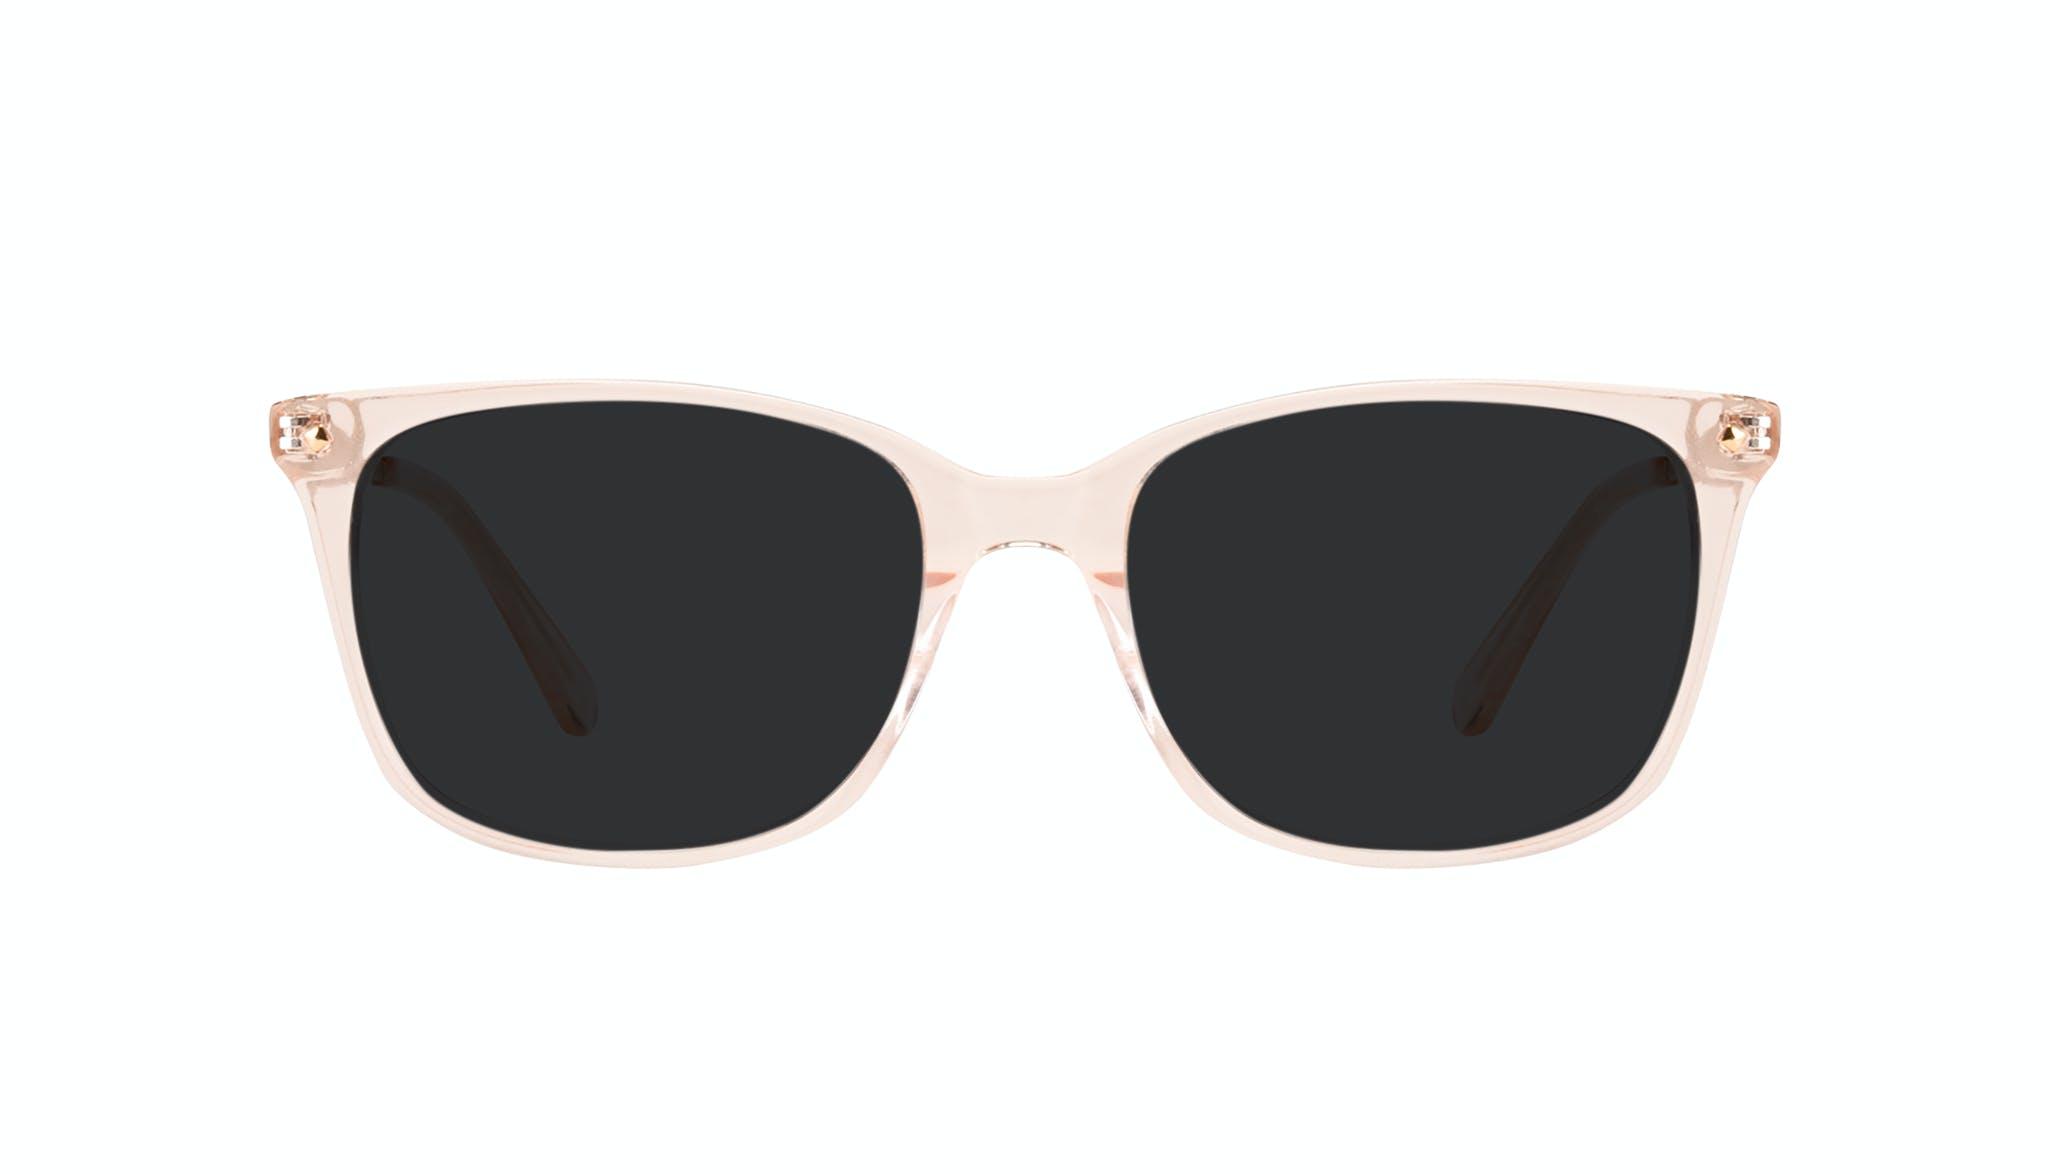 Affordable Fashion Glasses Rectangle Square Sunglasses Women Refine Blond Front